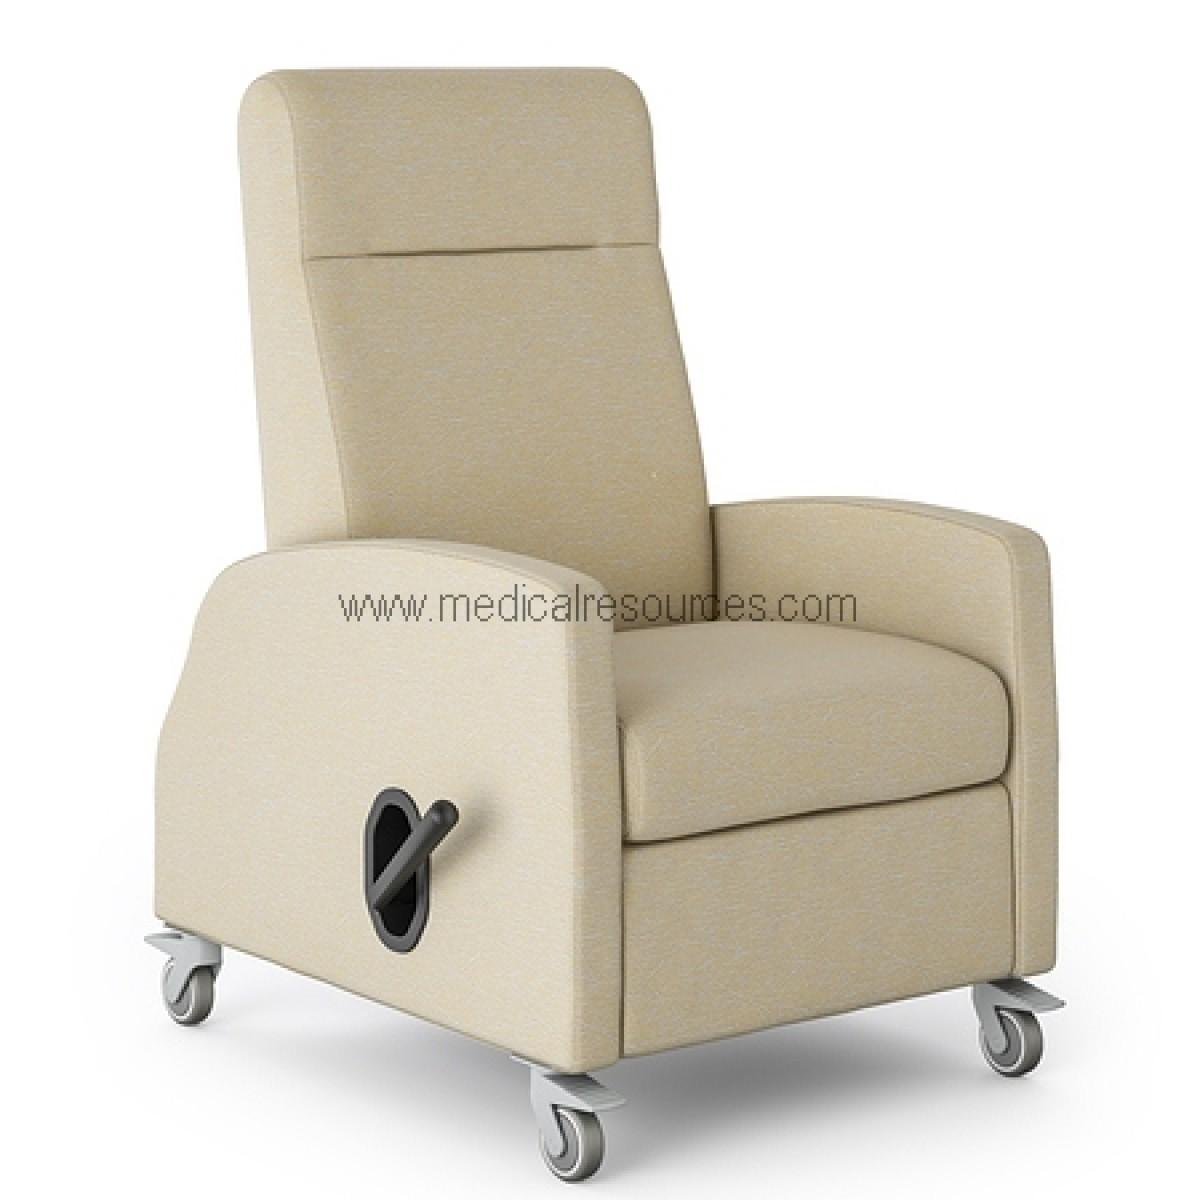 medical recliner chairs caravan zero gravity lounge chair la z boy rema mobile non locking back grade 3 vinyl